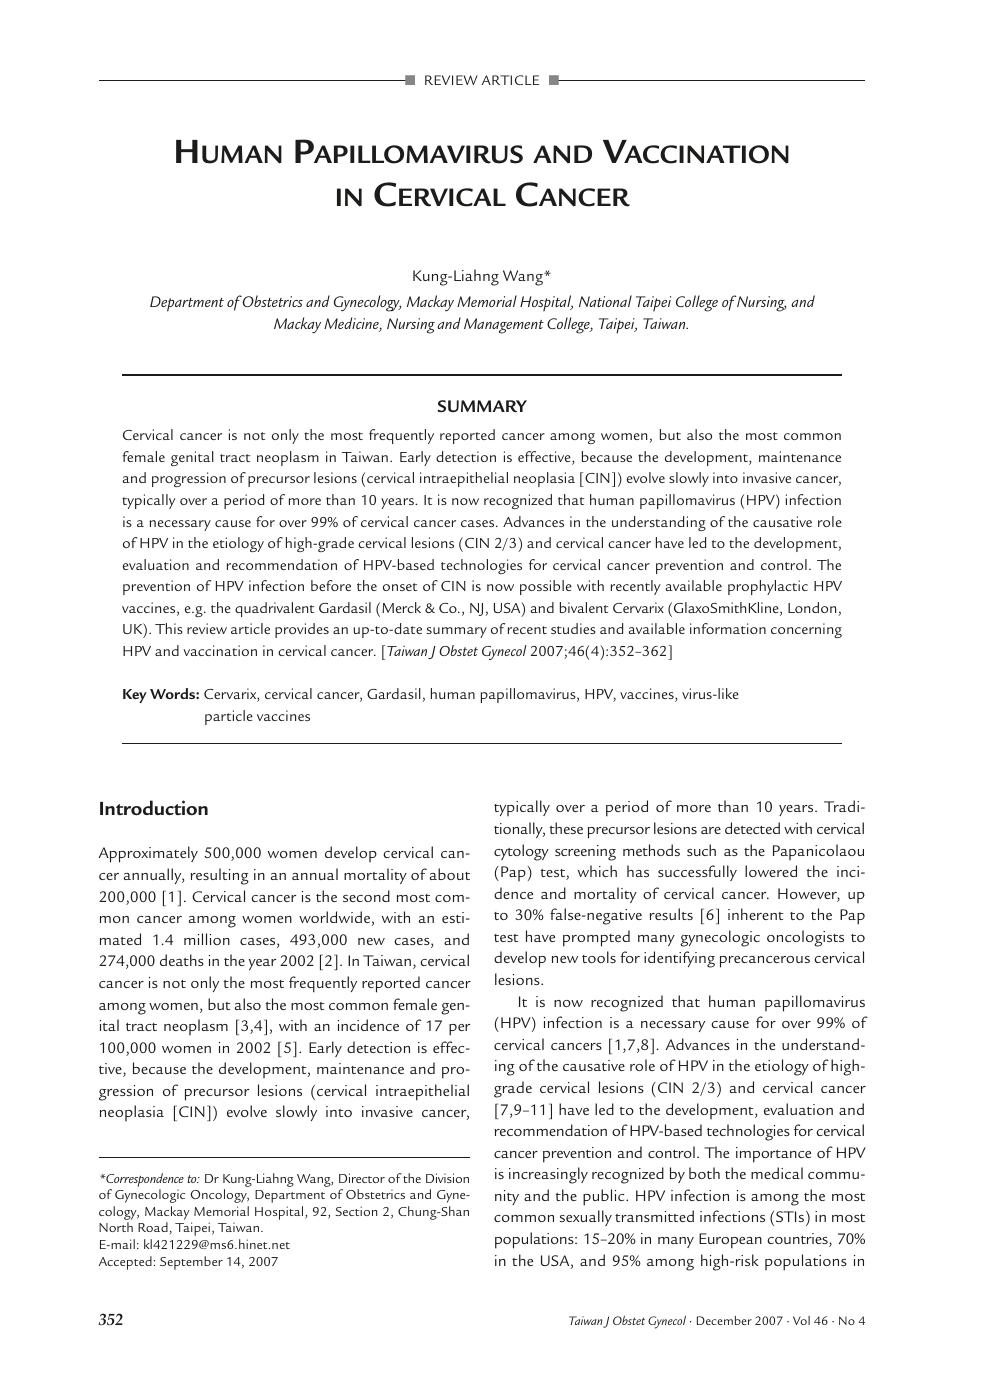 human papillomavirus review article nutriție pentru enterobiază